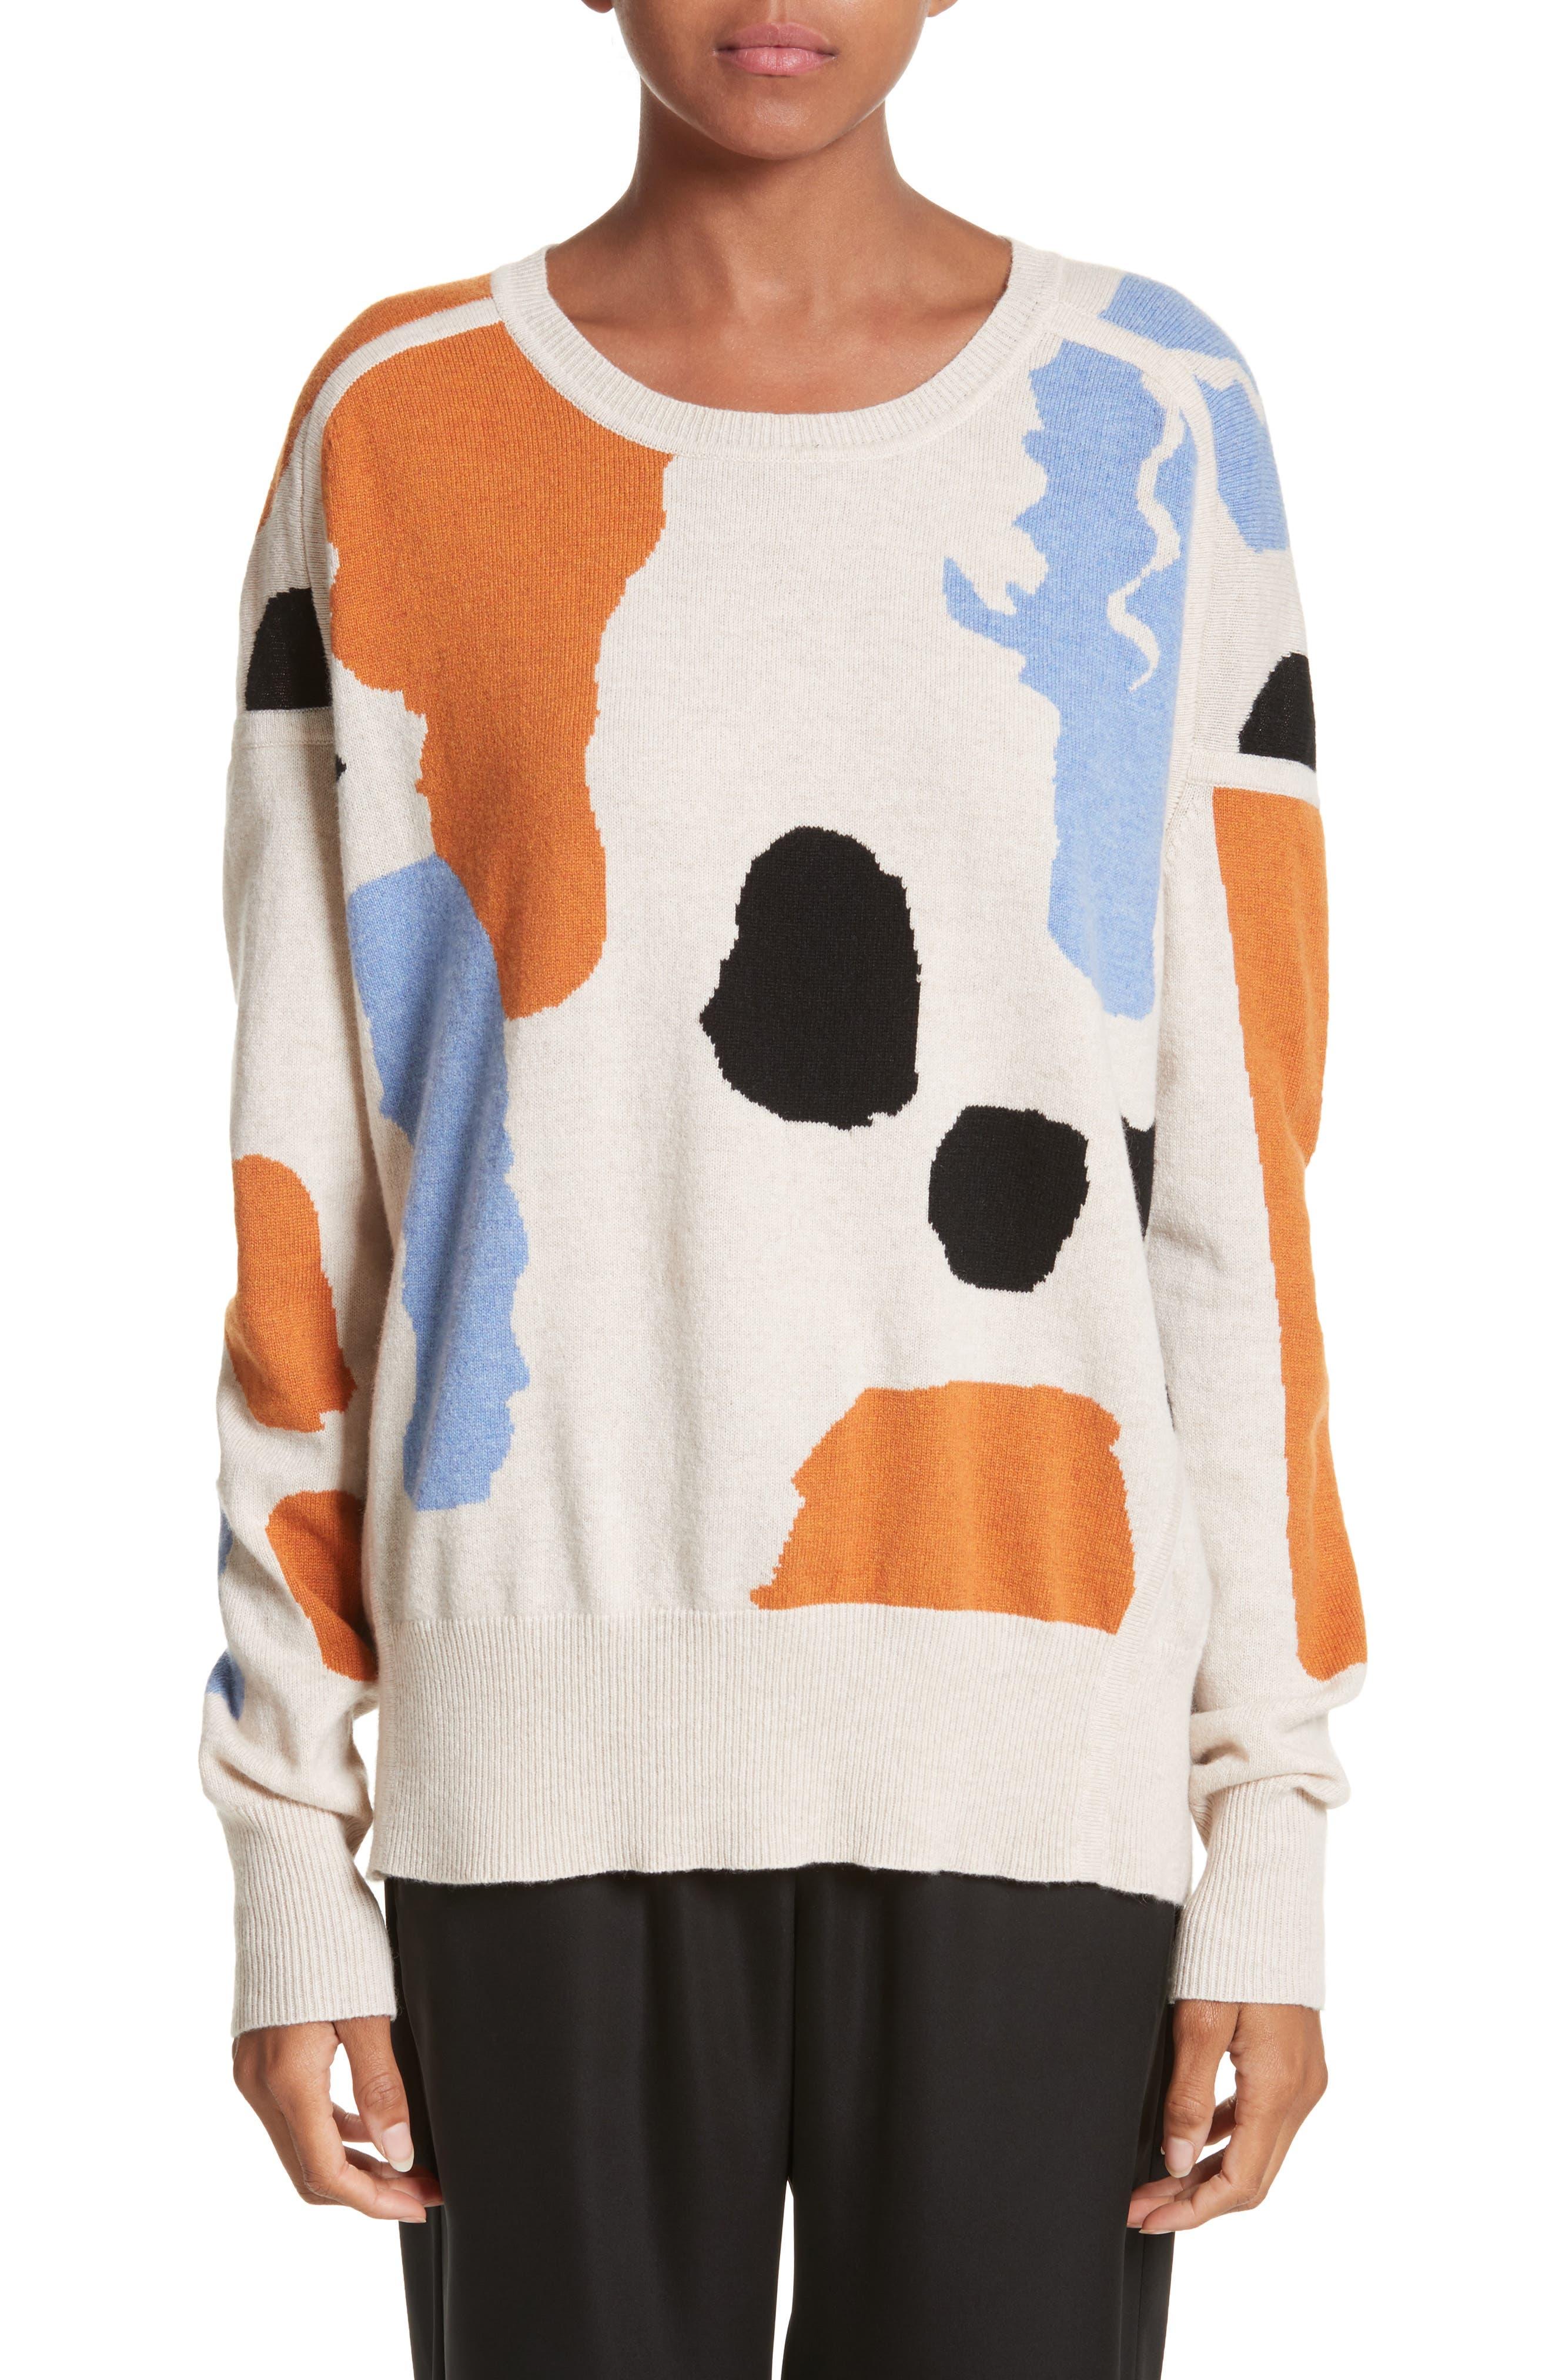 ZERO + MARIA CORNEJO,                             Palette Cashmere & Merino Wool Sweater,                             Main thumbnail 1, color,                             902